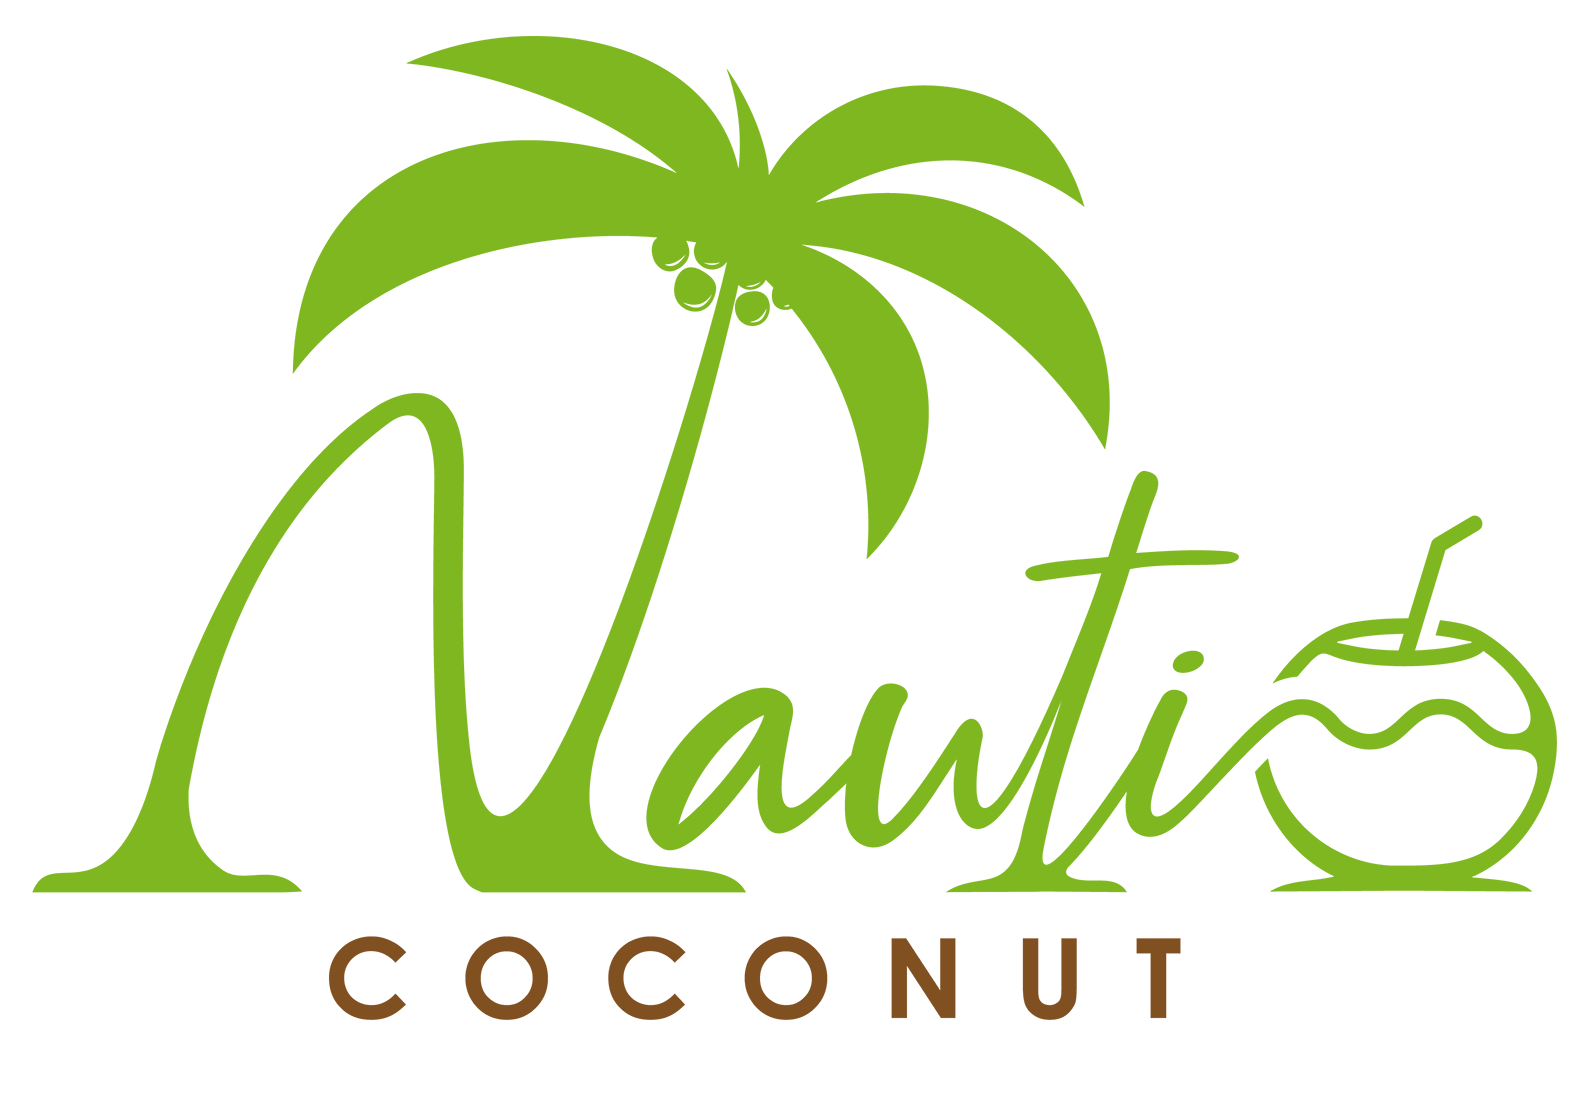 SWFL Nauti Coconut Fresh Coconuts